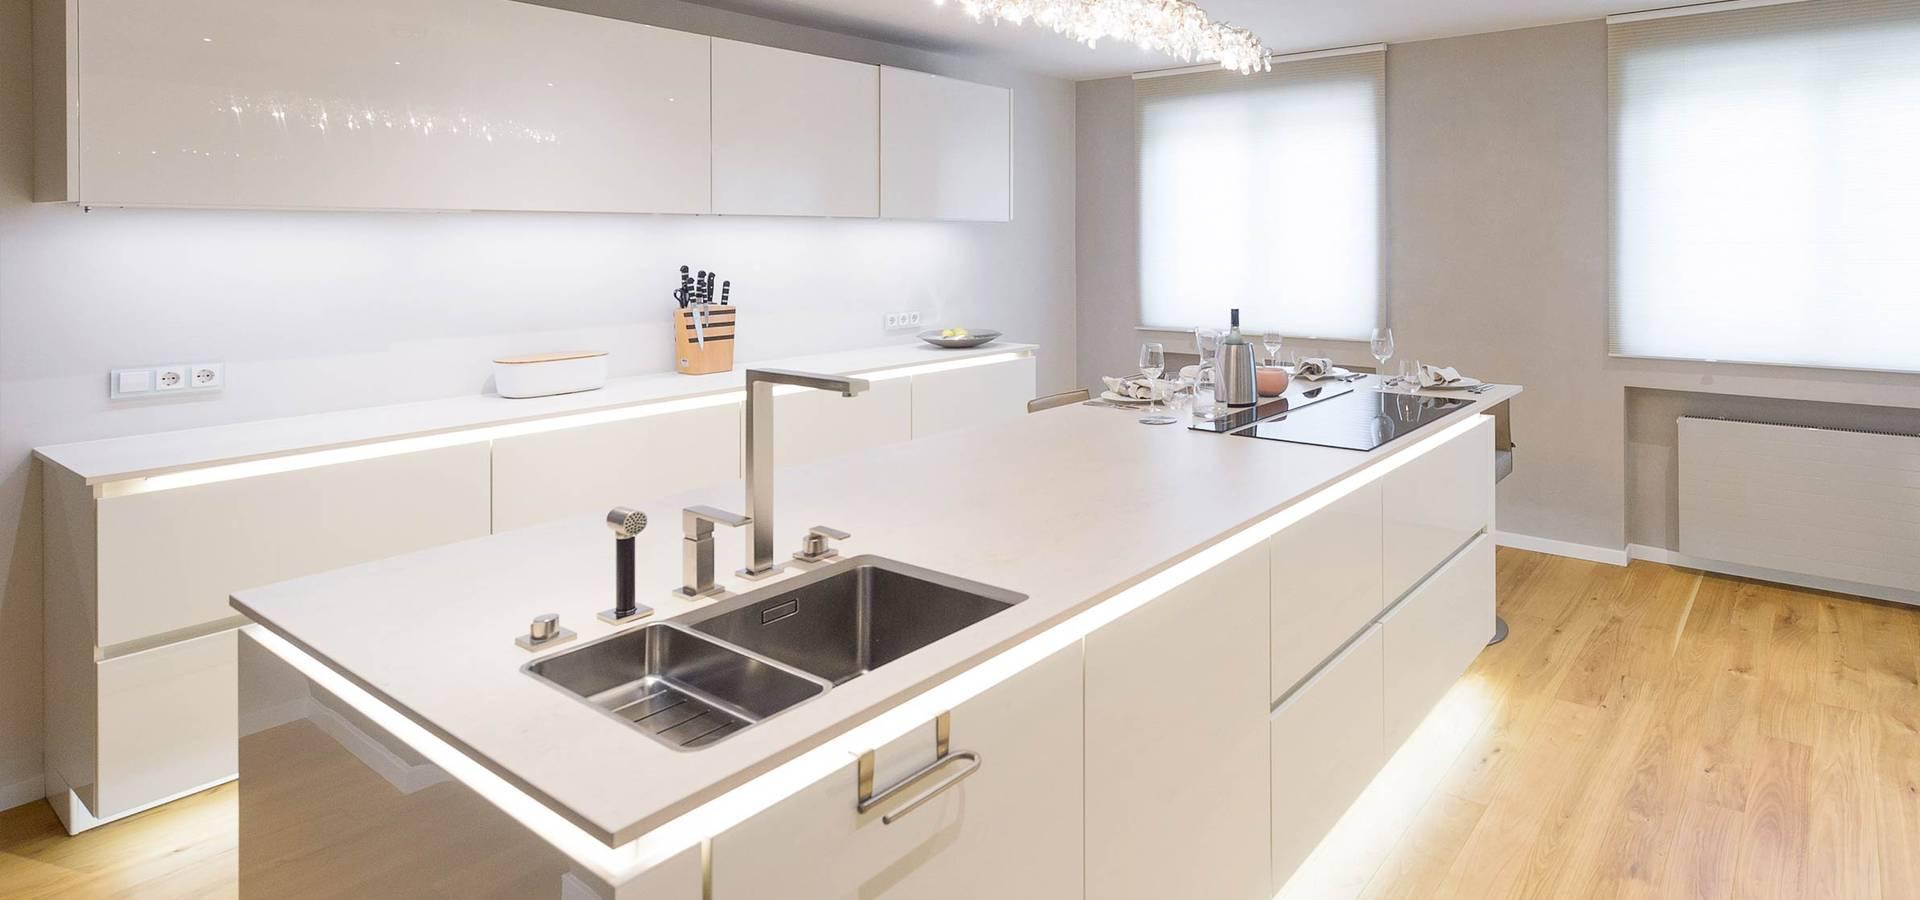 1001 design cuisinistes lyon sur homify. Black Bedroom Furniture Sets. Home Design Ideas